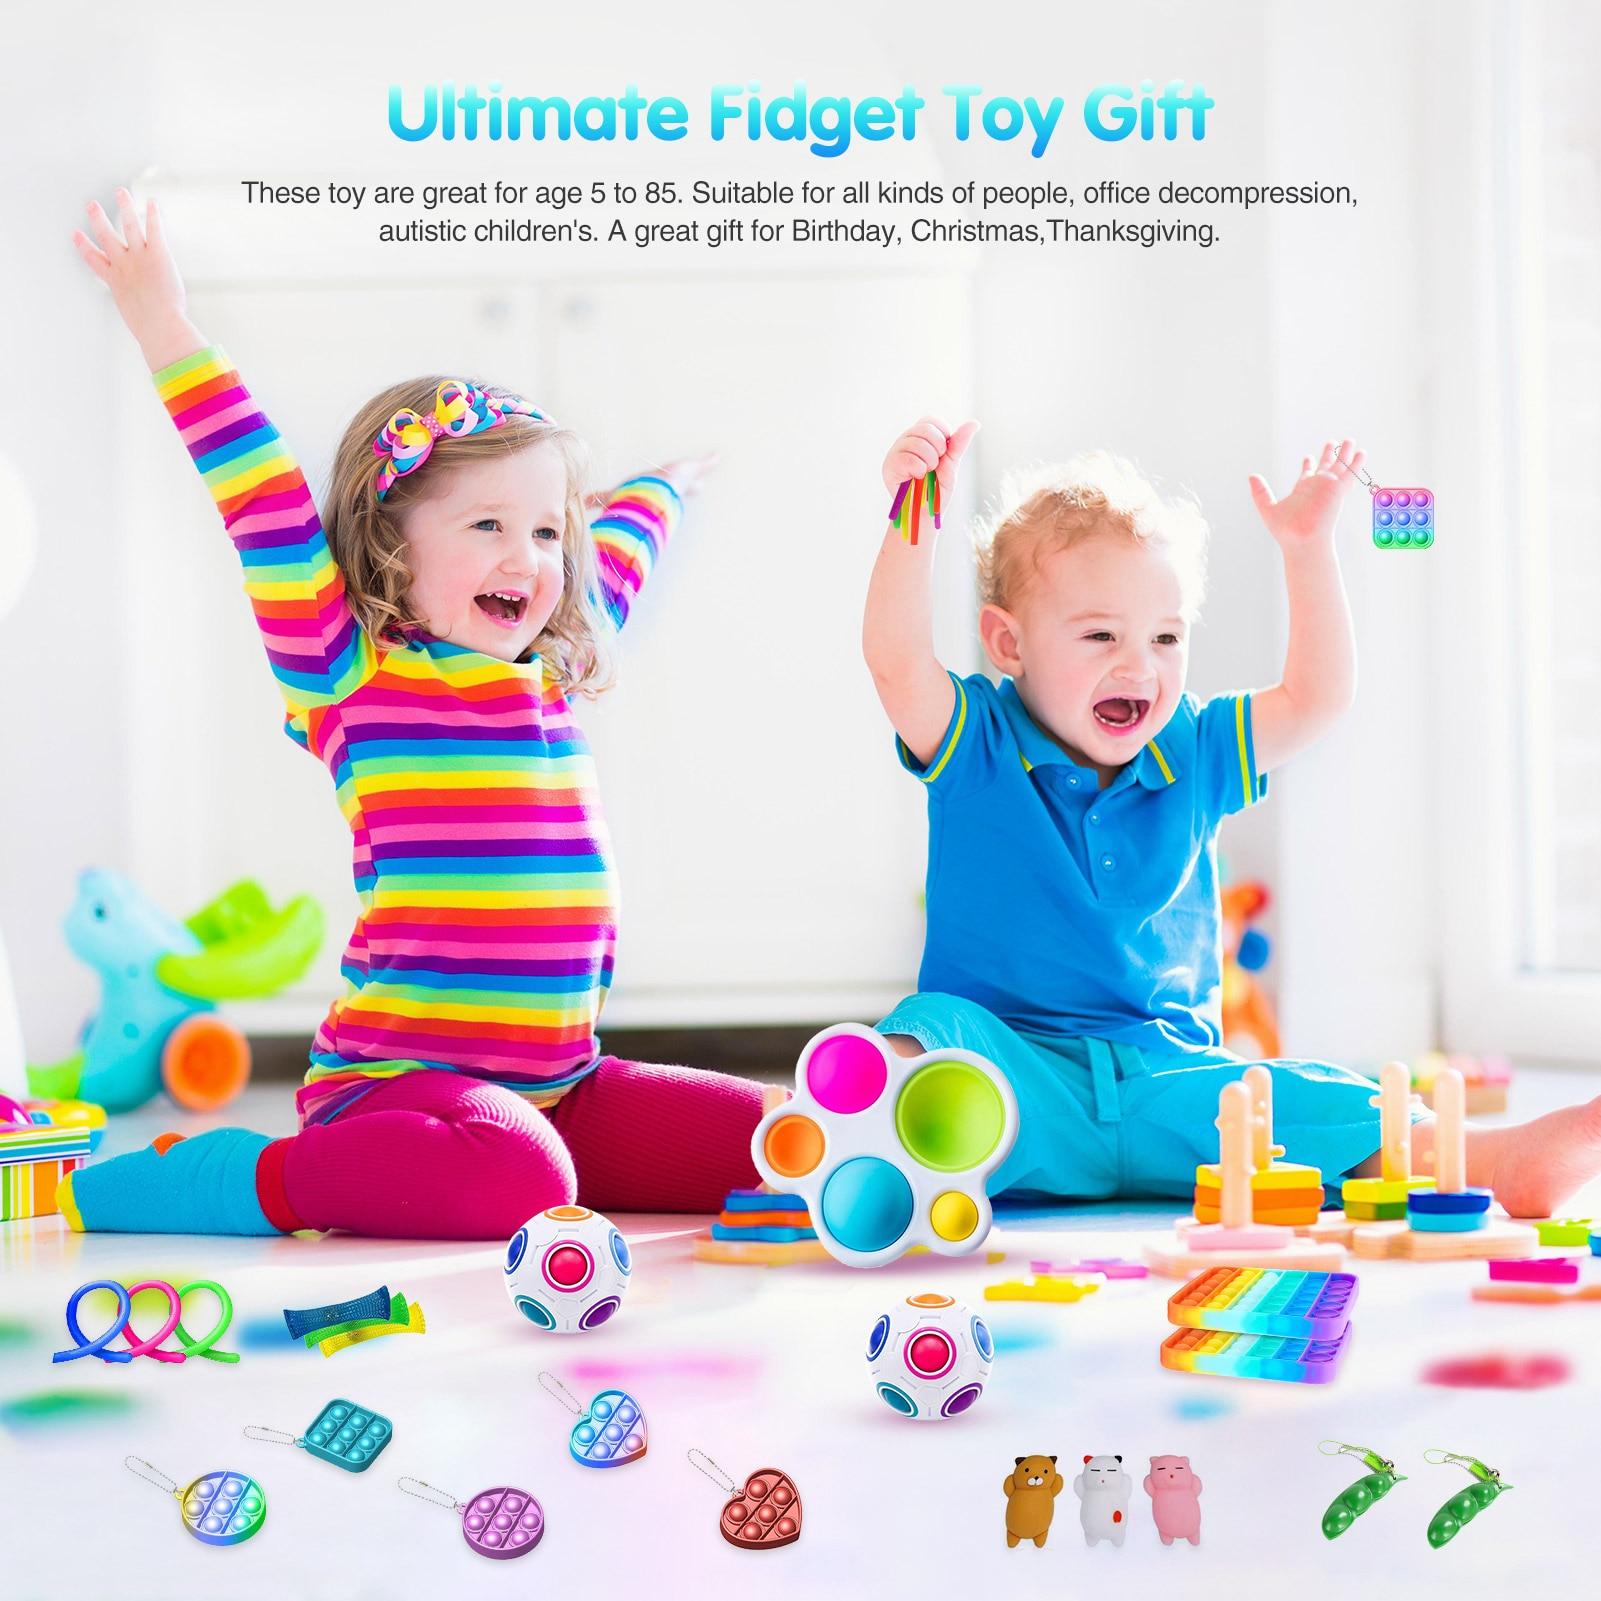 23PCS Push Bubble Silicone Sensory Toy Set Decompression Stress Reliver Toy Various Types Colorful Simple Dimple Fidget Toy Set enlarge